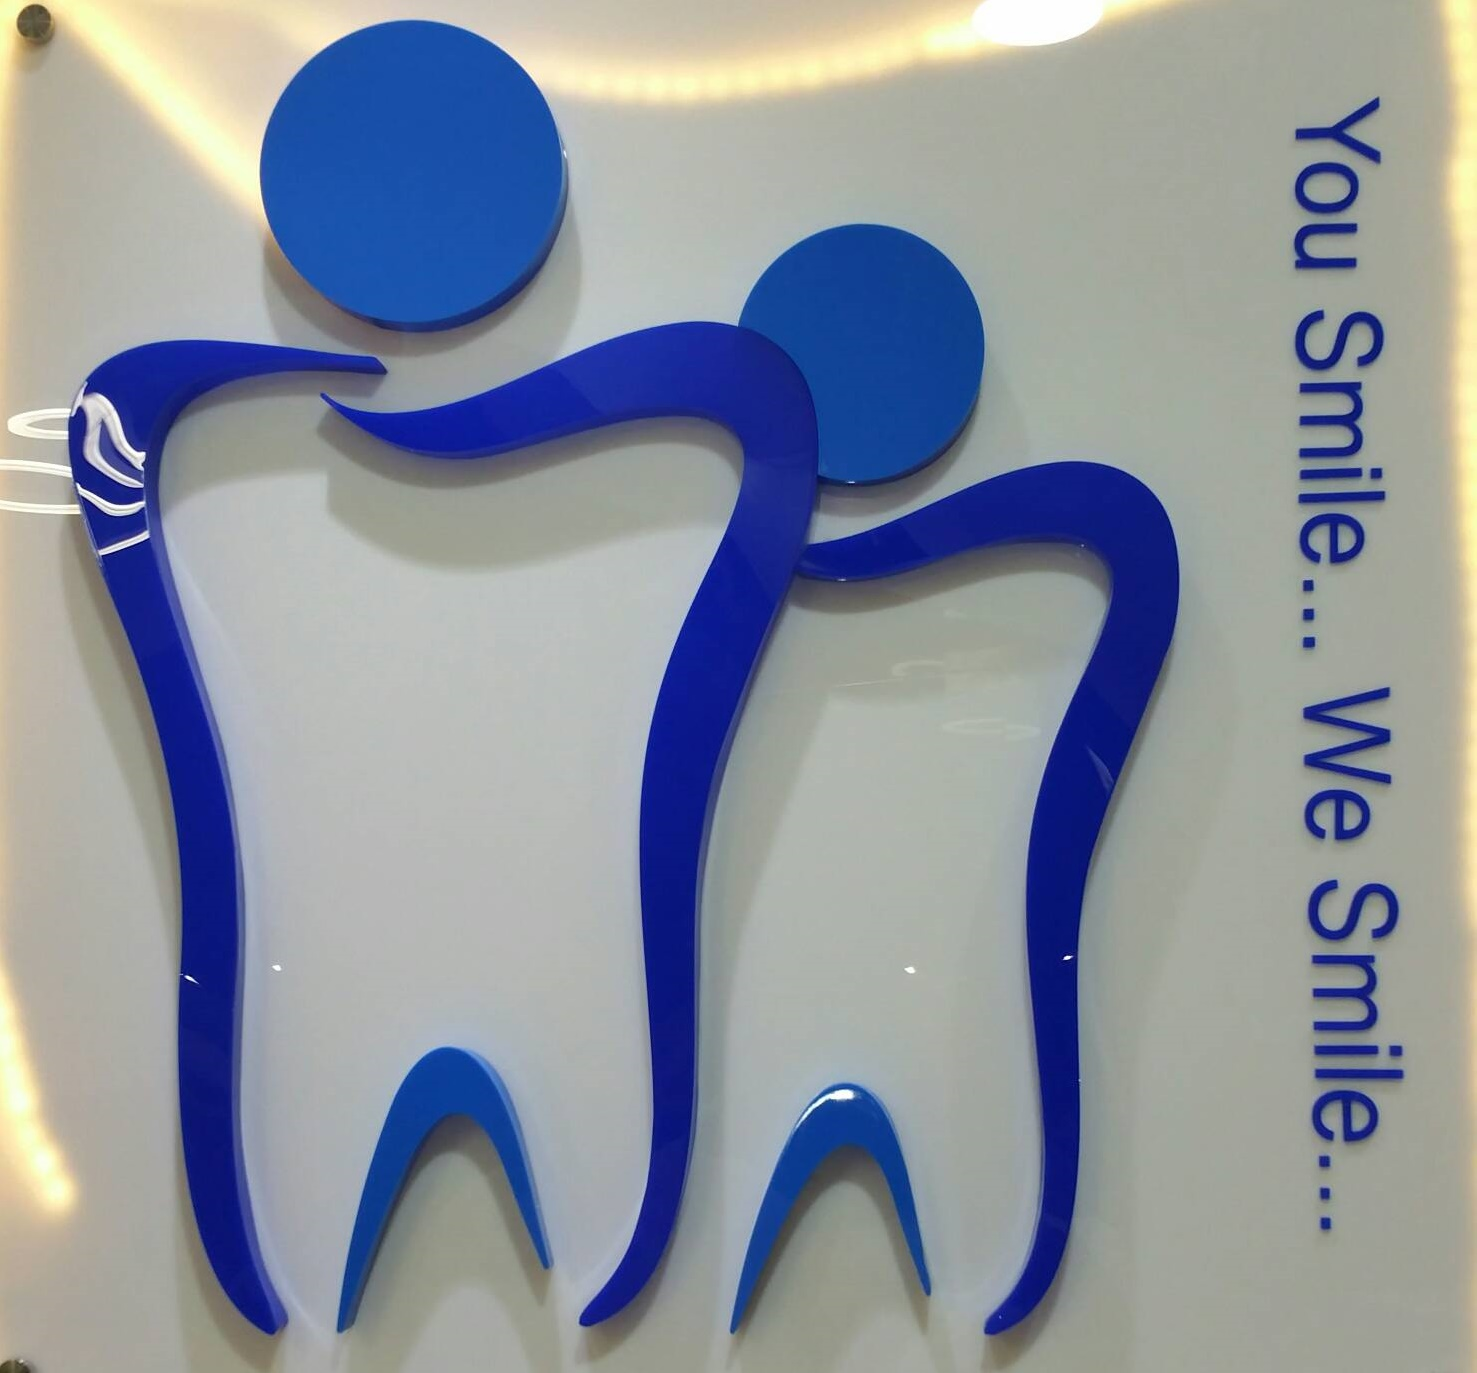 sedation service in chikhali pune practo dr kukreja s premium dental clinic